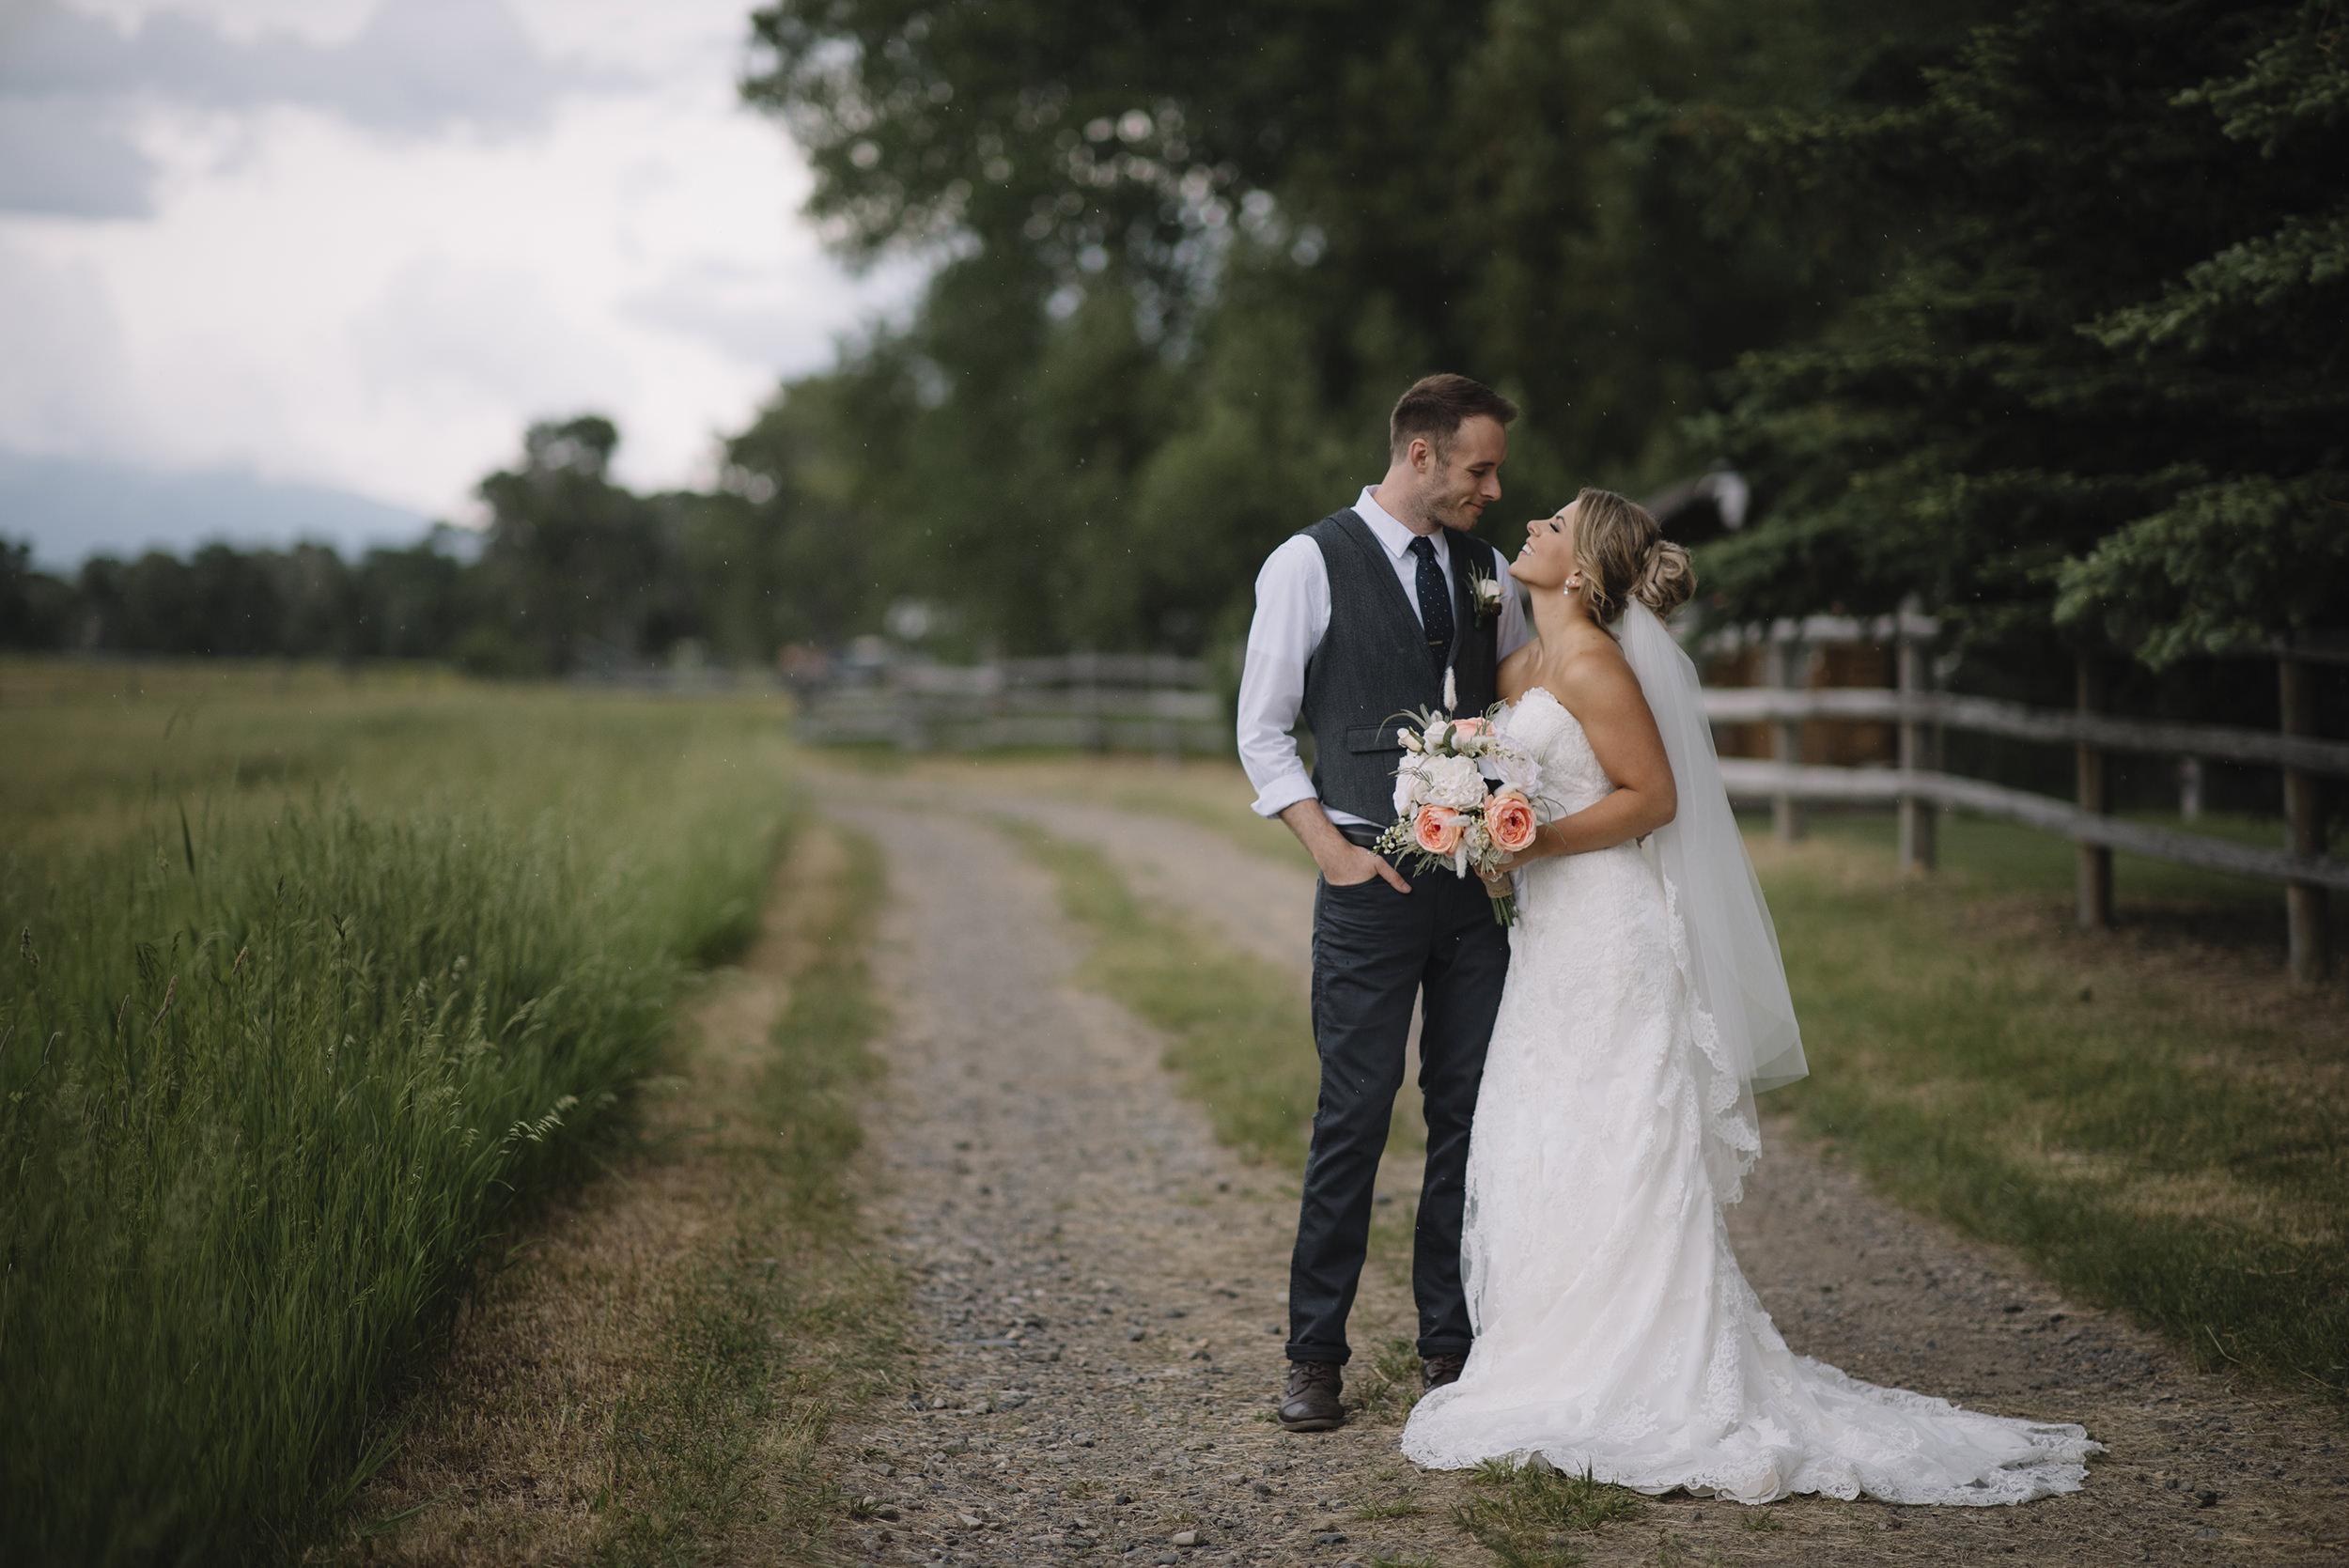 Colby-and-Jess-Intimate-Backyard-Wedding-Bozeman-Montana254.jpg